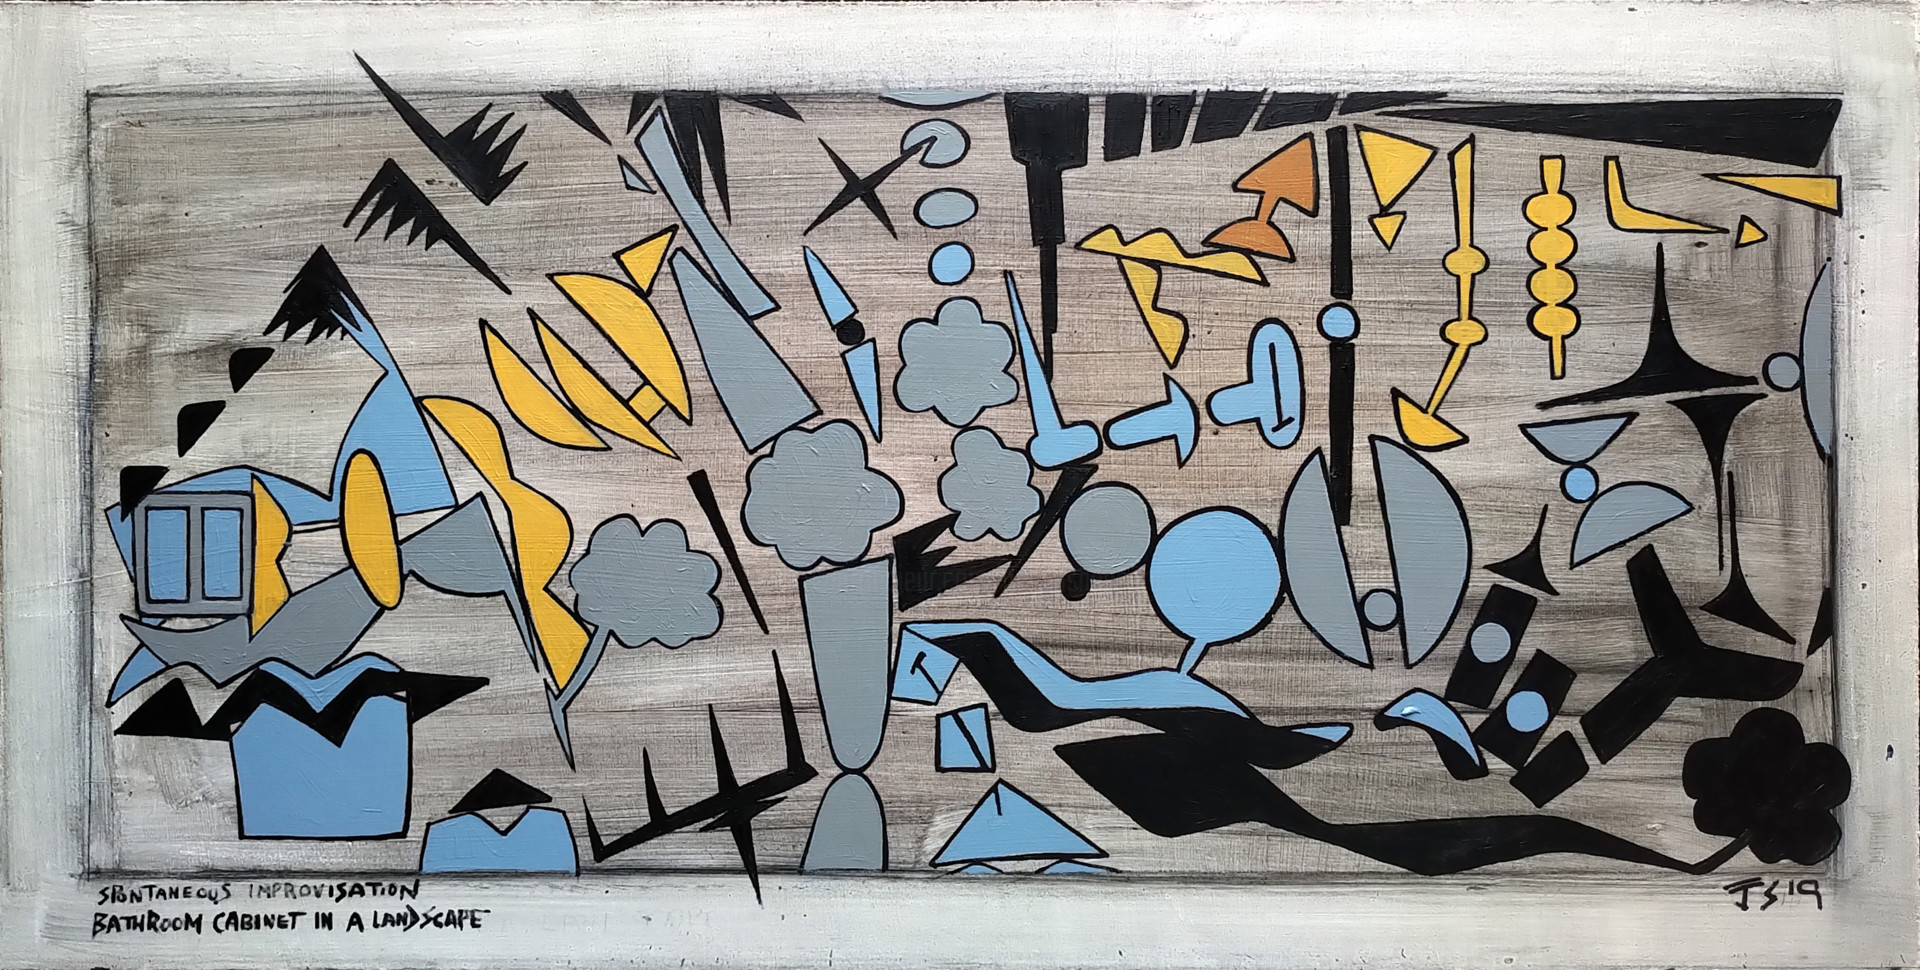 Gerald Shepherd - Bathroom Cabinet In A Landscape